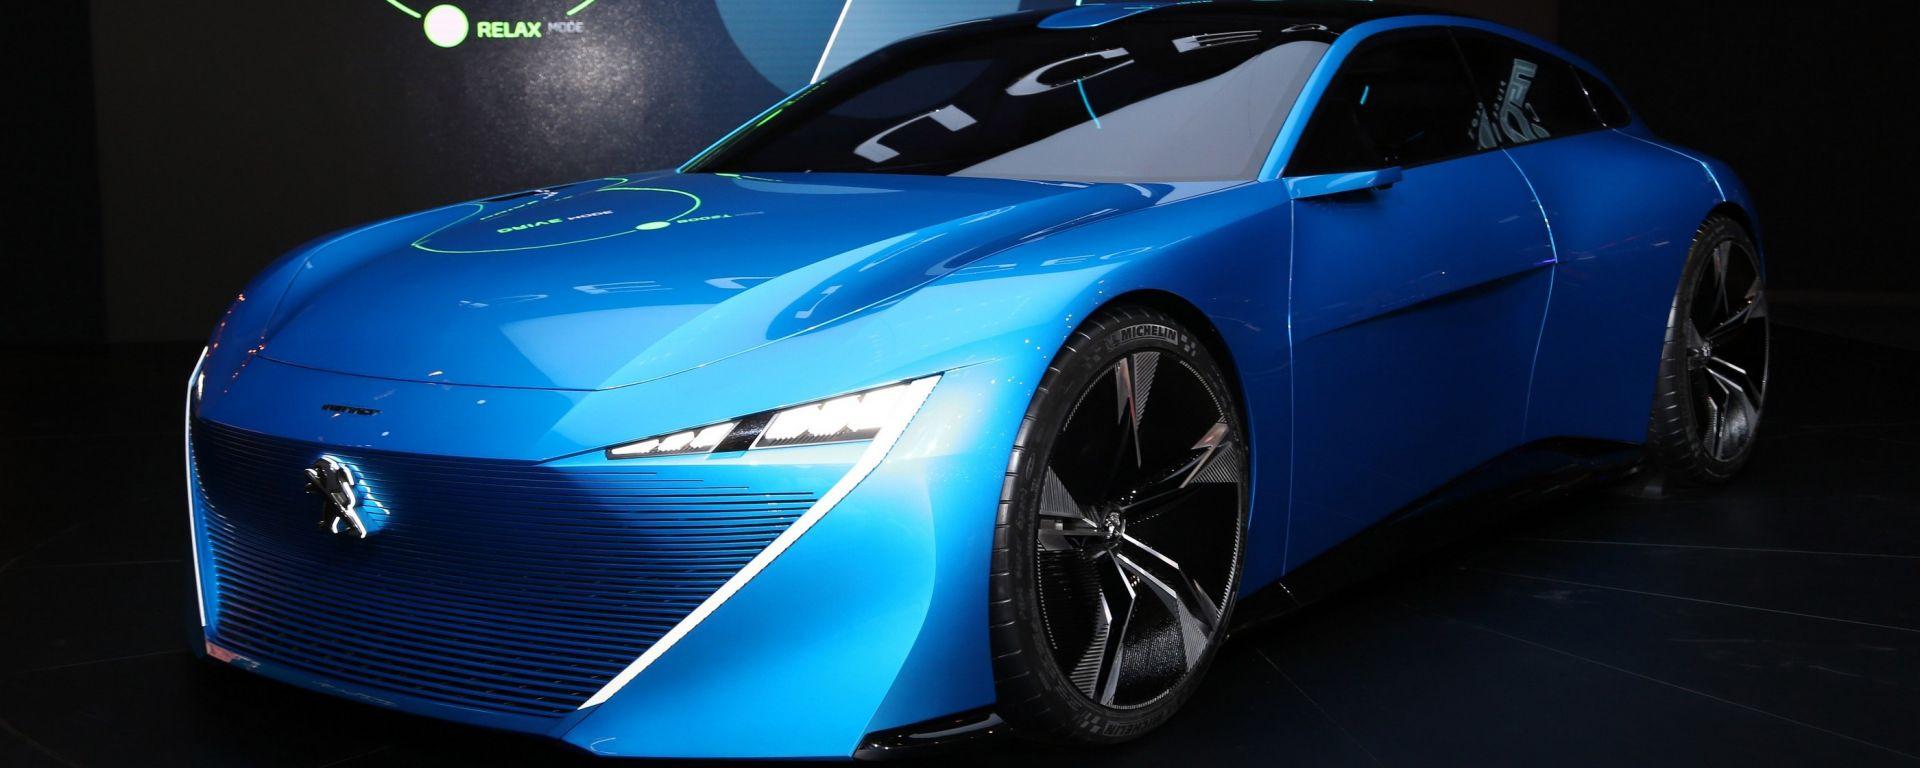 Peugeot Instinct Concept al Salone di Ginevra 2017